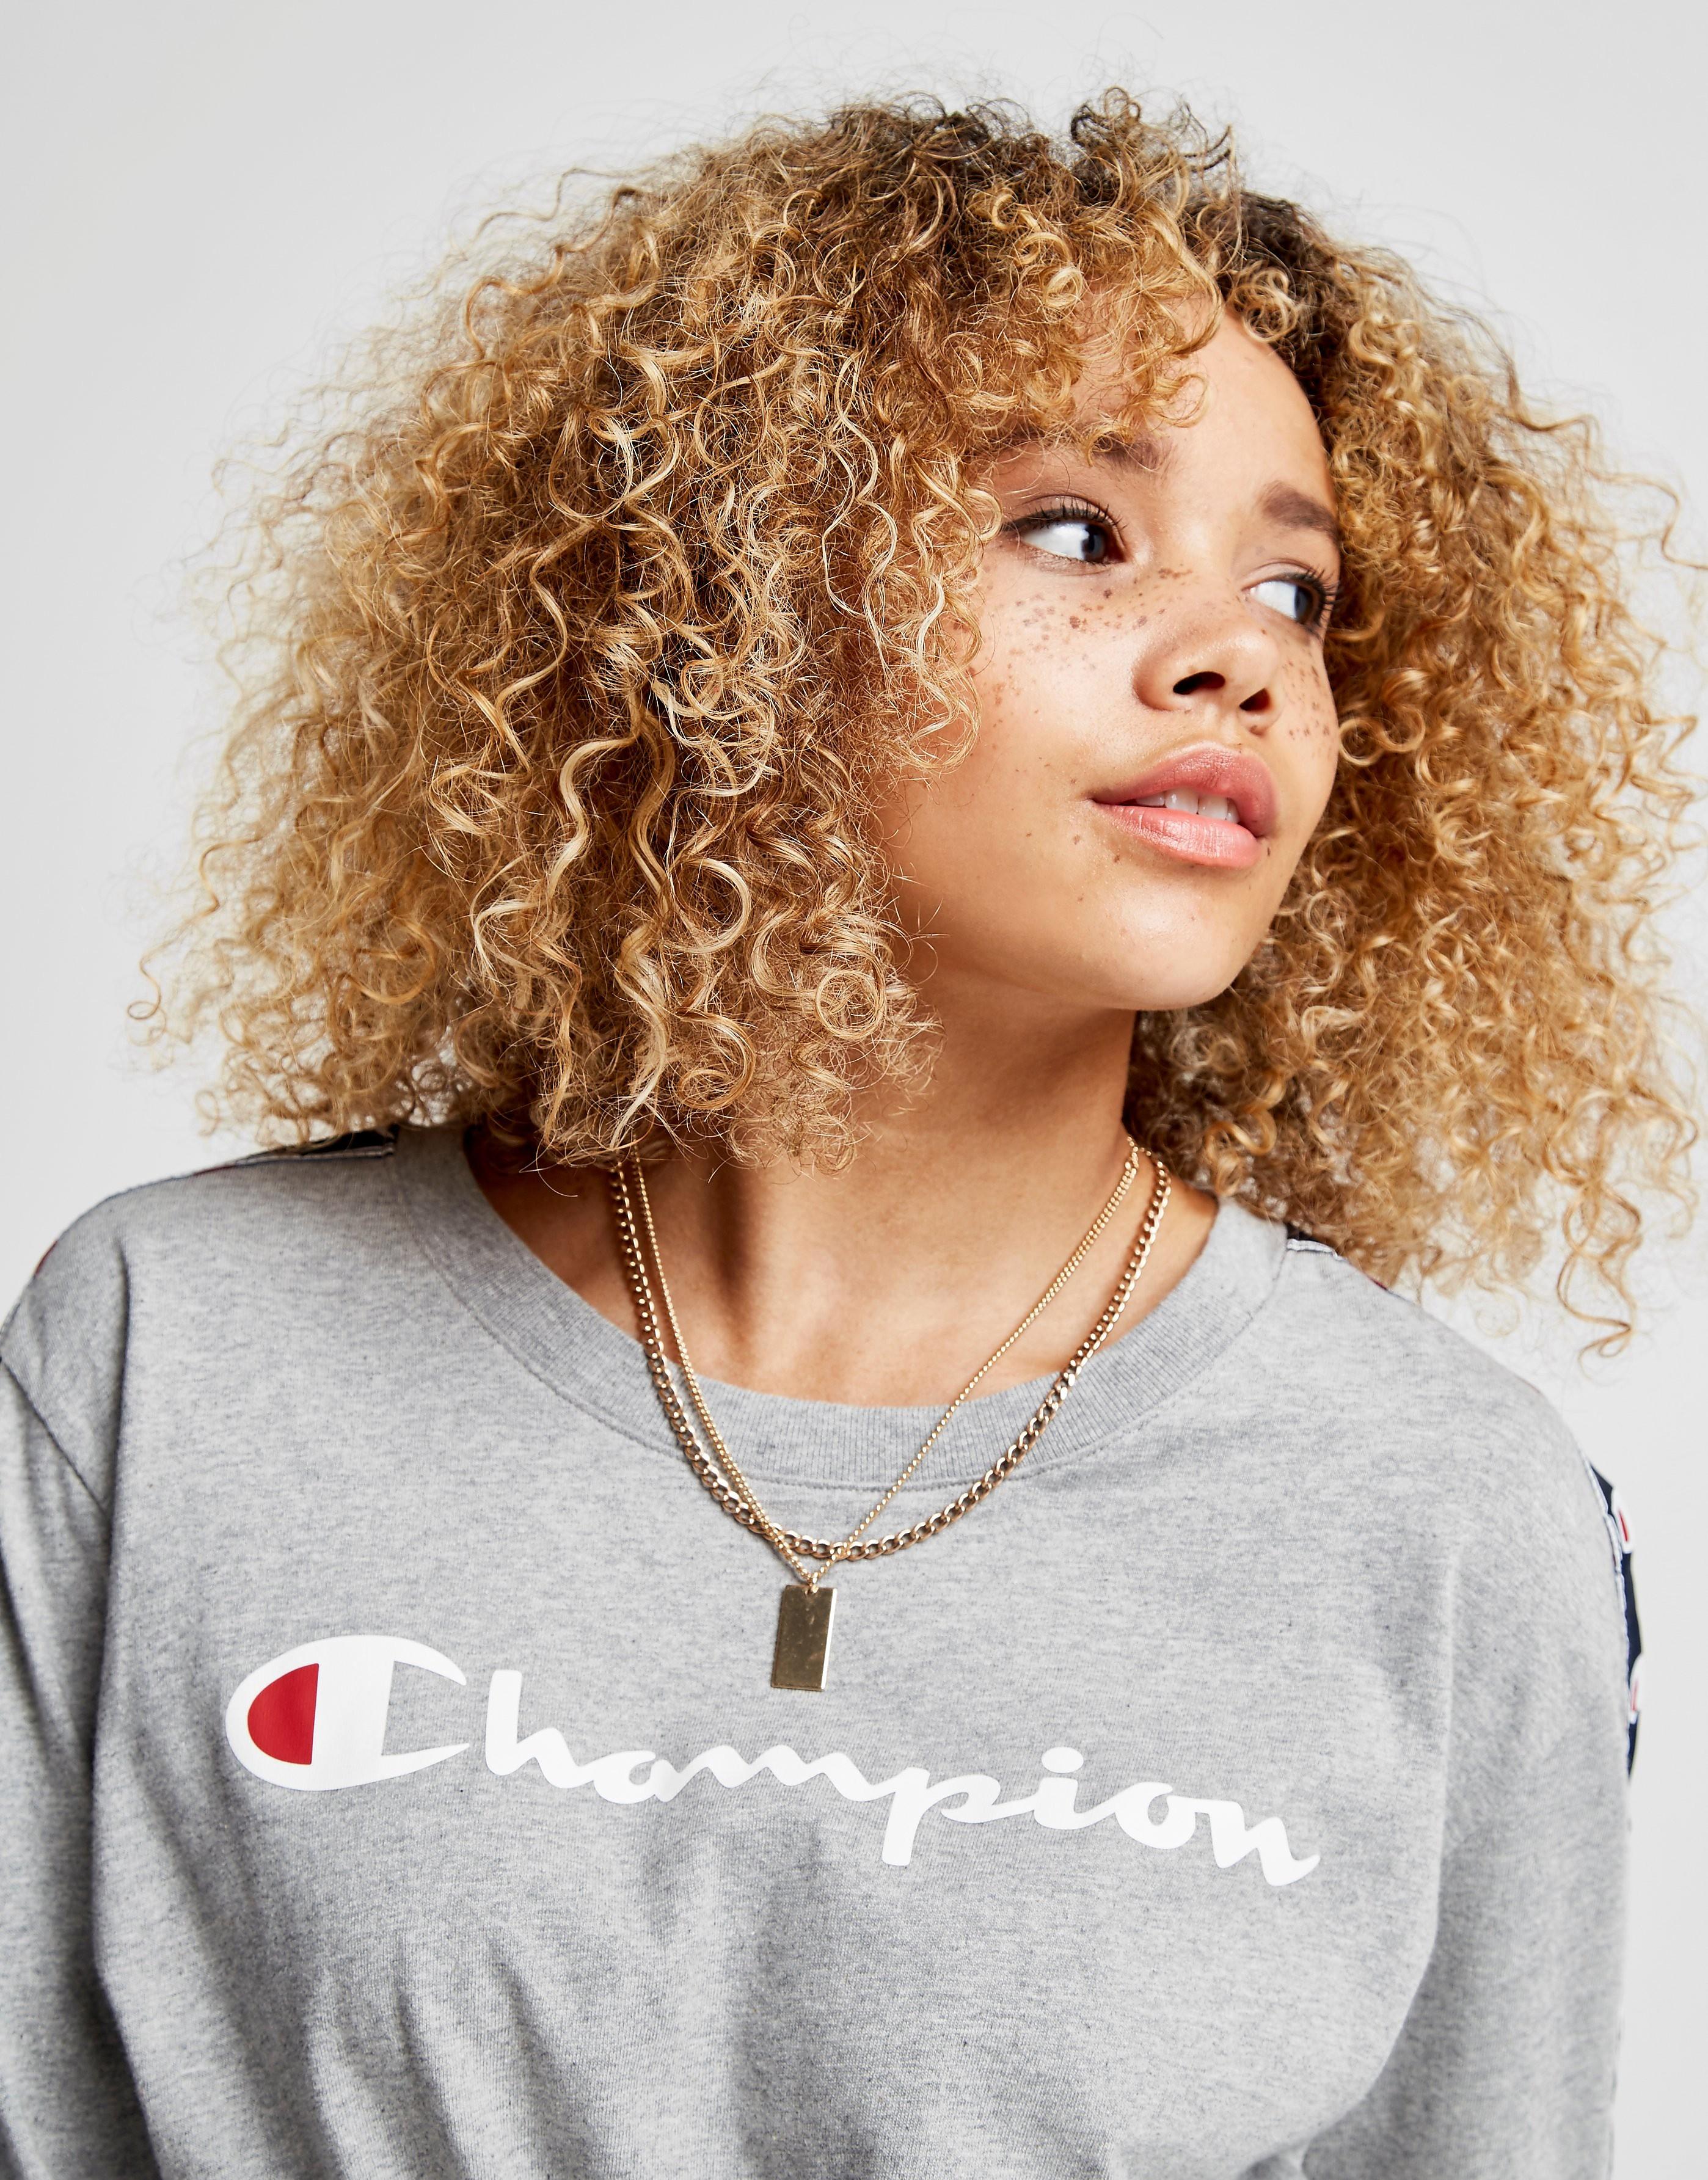 Champion Tape Long Sleeve Script T-Shirt